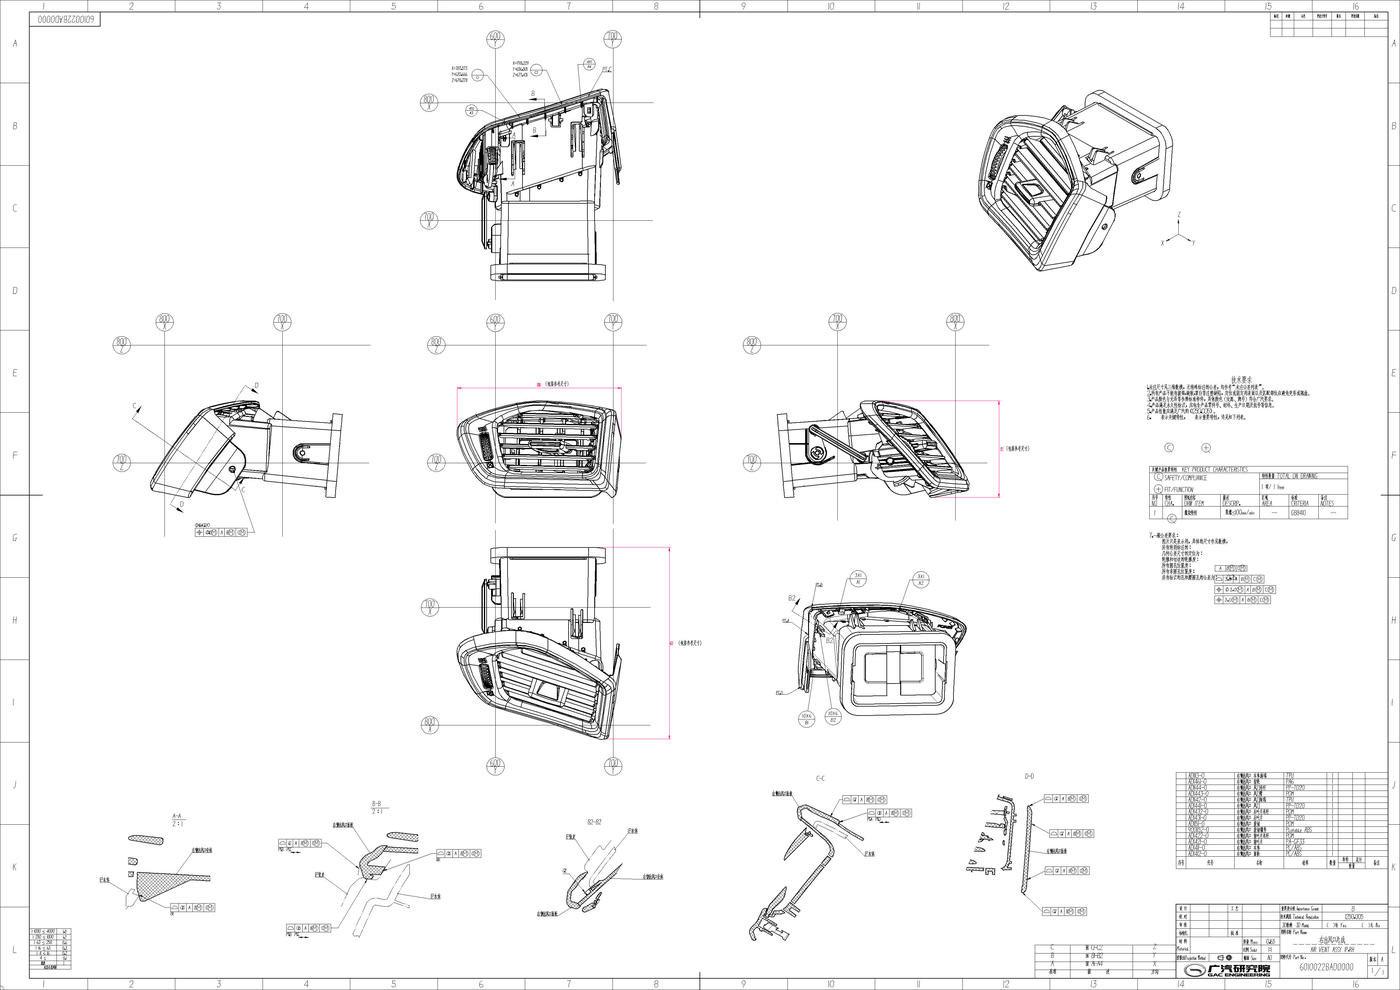 Air Vent Automotive Interior Plastic Parts Catia Alias By Daisi Hu At Coroflot